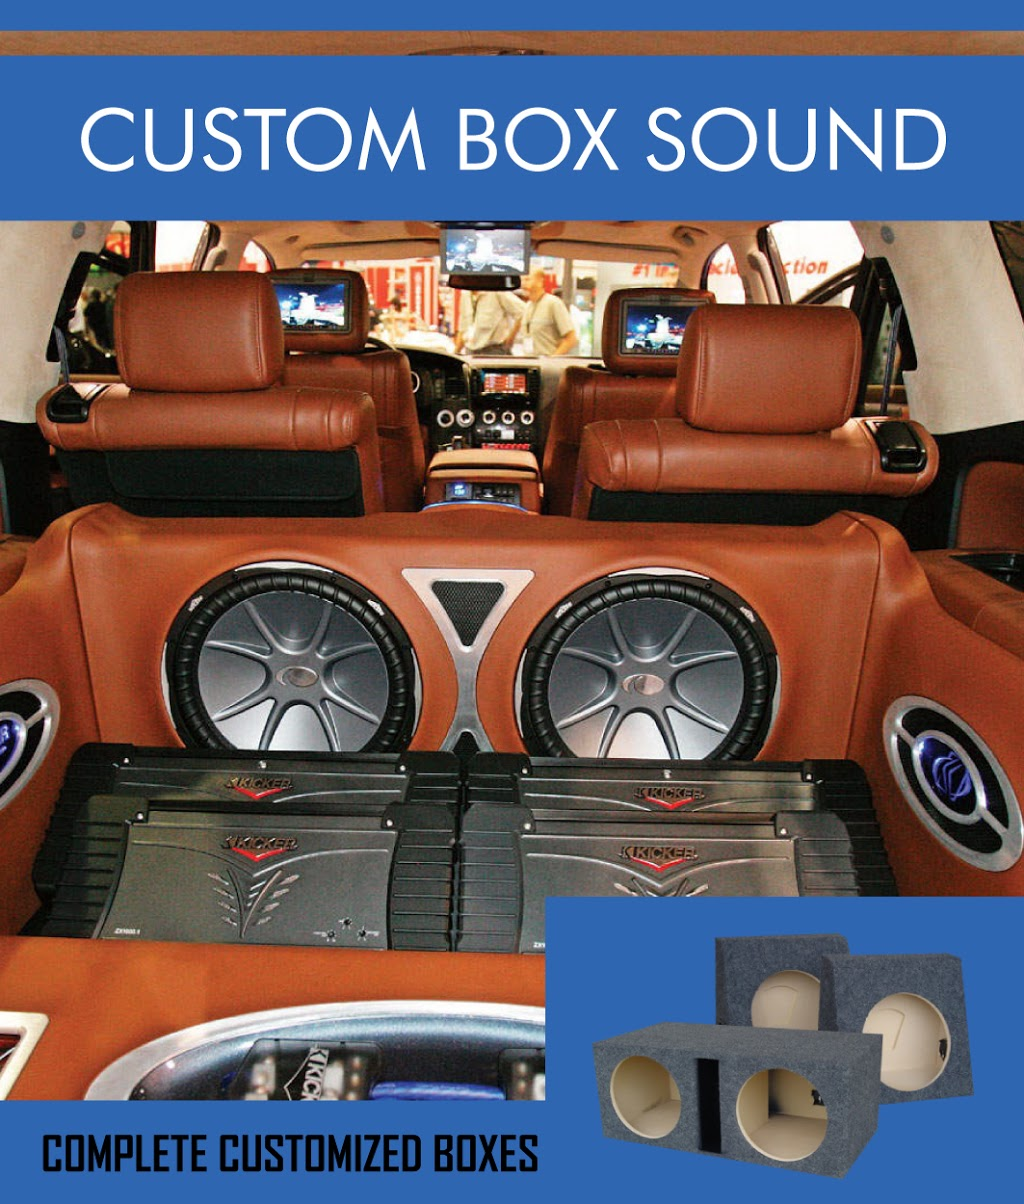 Livewire Customs - car repair  | Photo 3 of 10 | Address: 1309 W Texas St, Fairfield, CA 94533, USA | Phone: (707) 389-4969